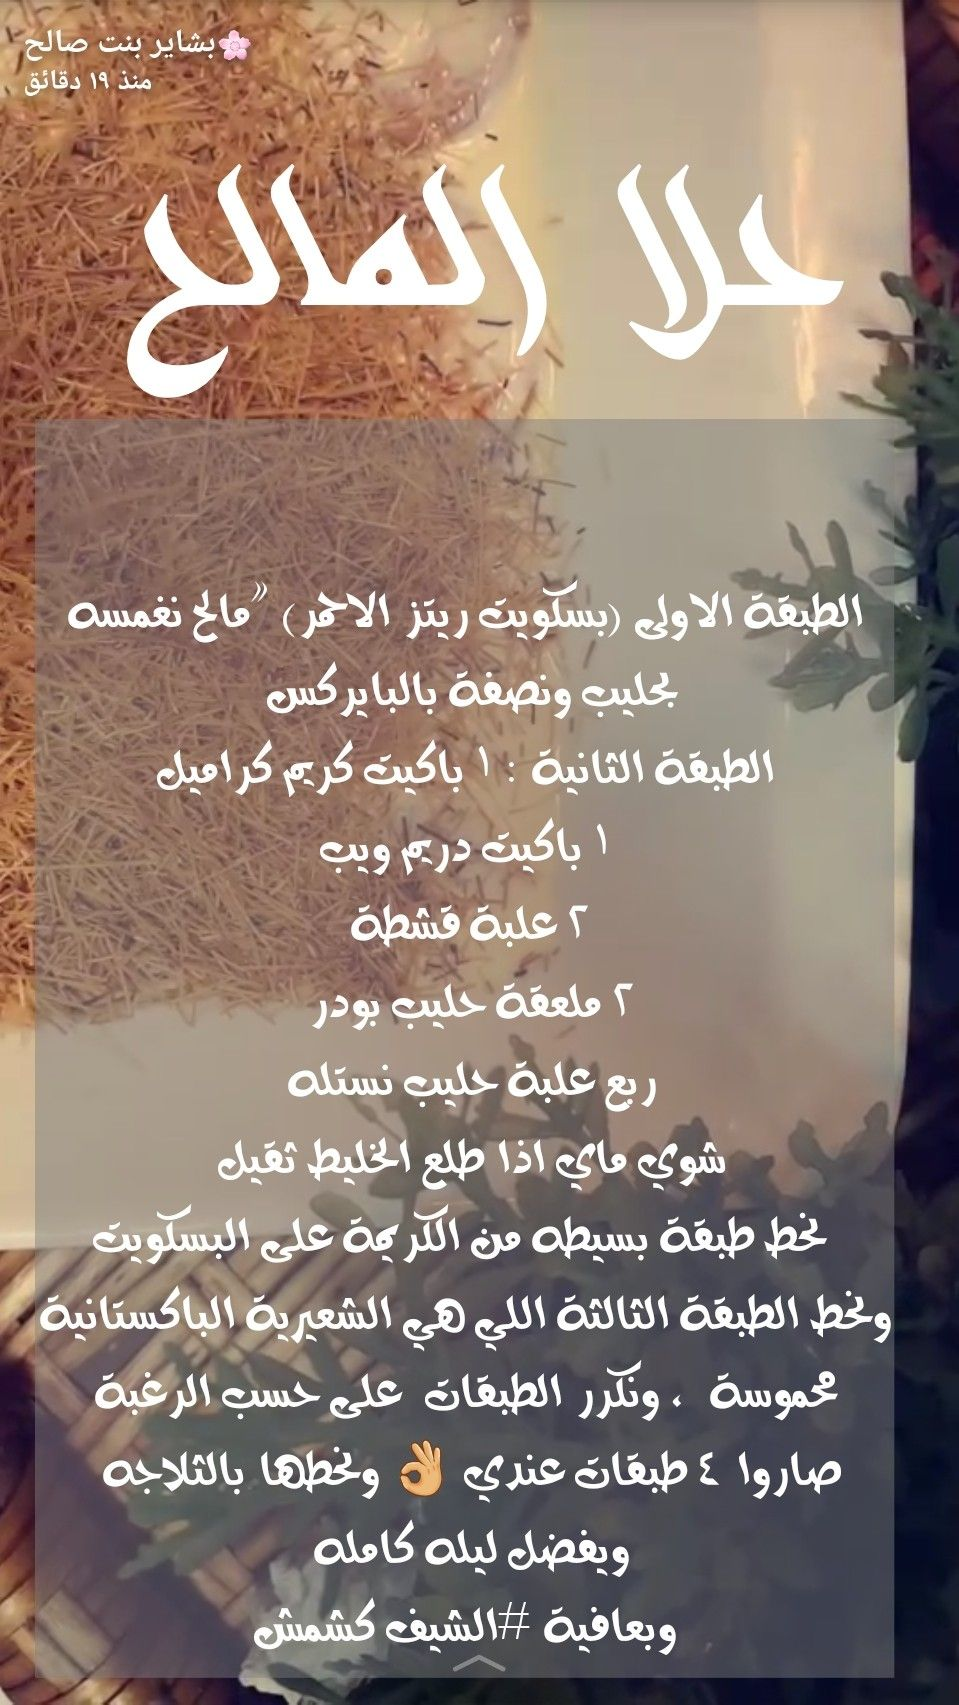 حلا مالح Turkish Recipes Arabic Food Dessert Recipes